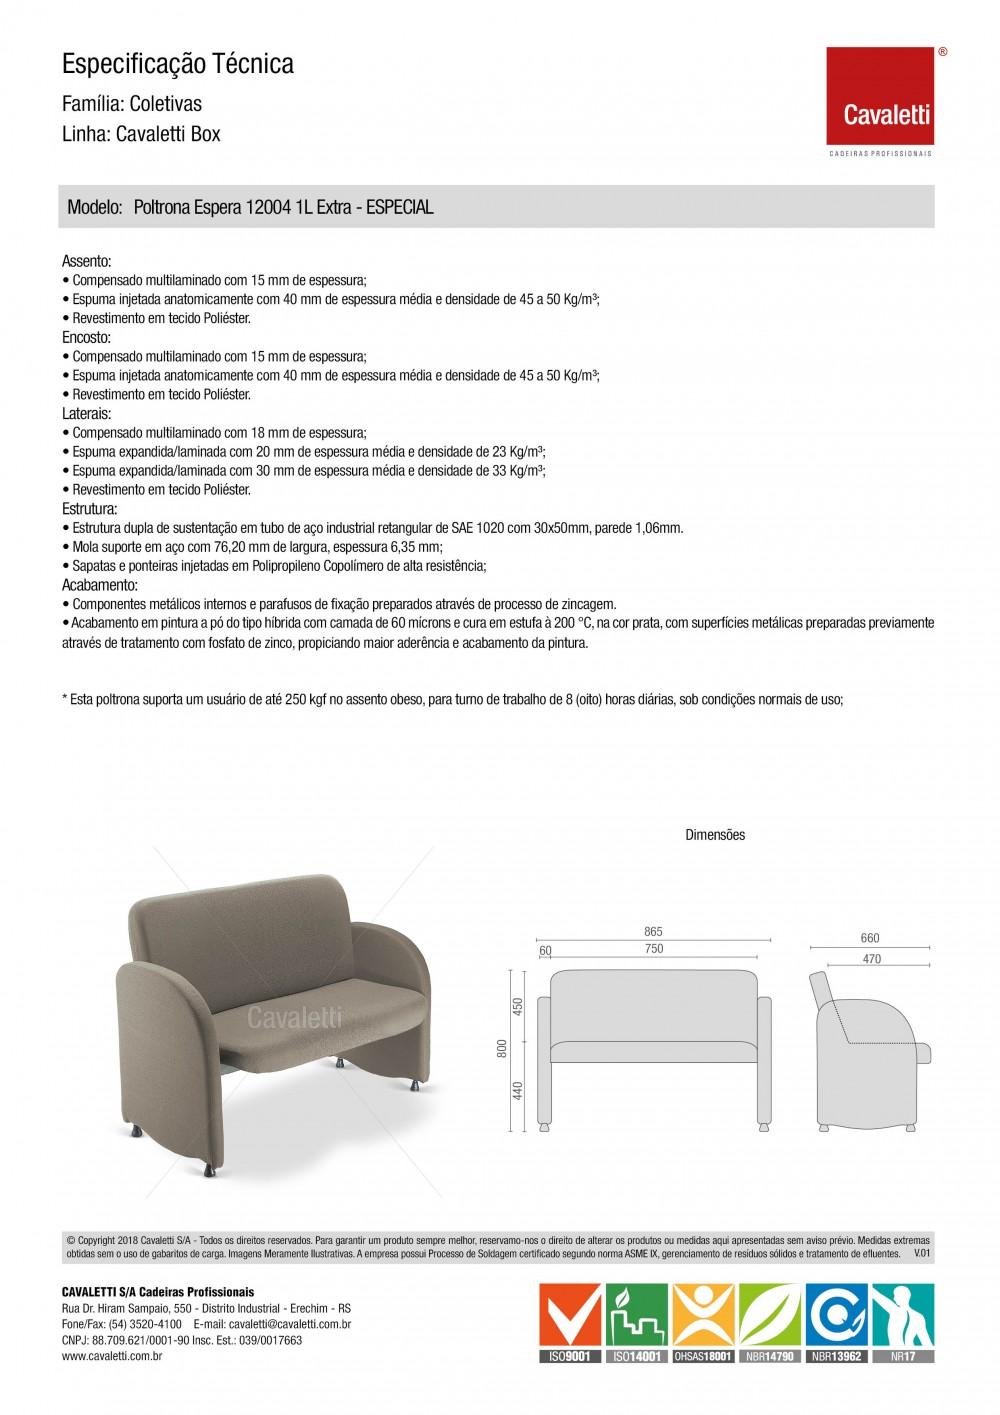 Poltrona Espera 12004 Extra - 1 Lugar -  Linha Box - Capacidade 250kg - Cavaletti -